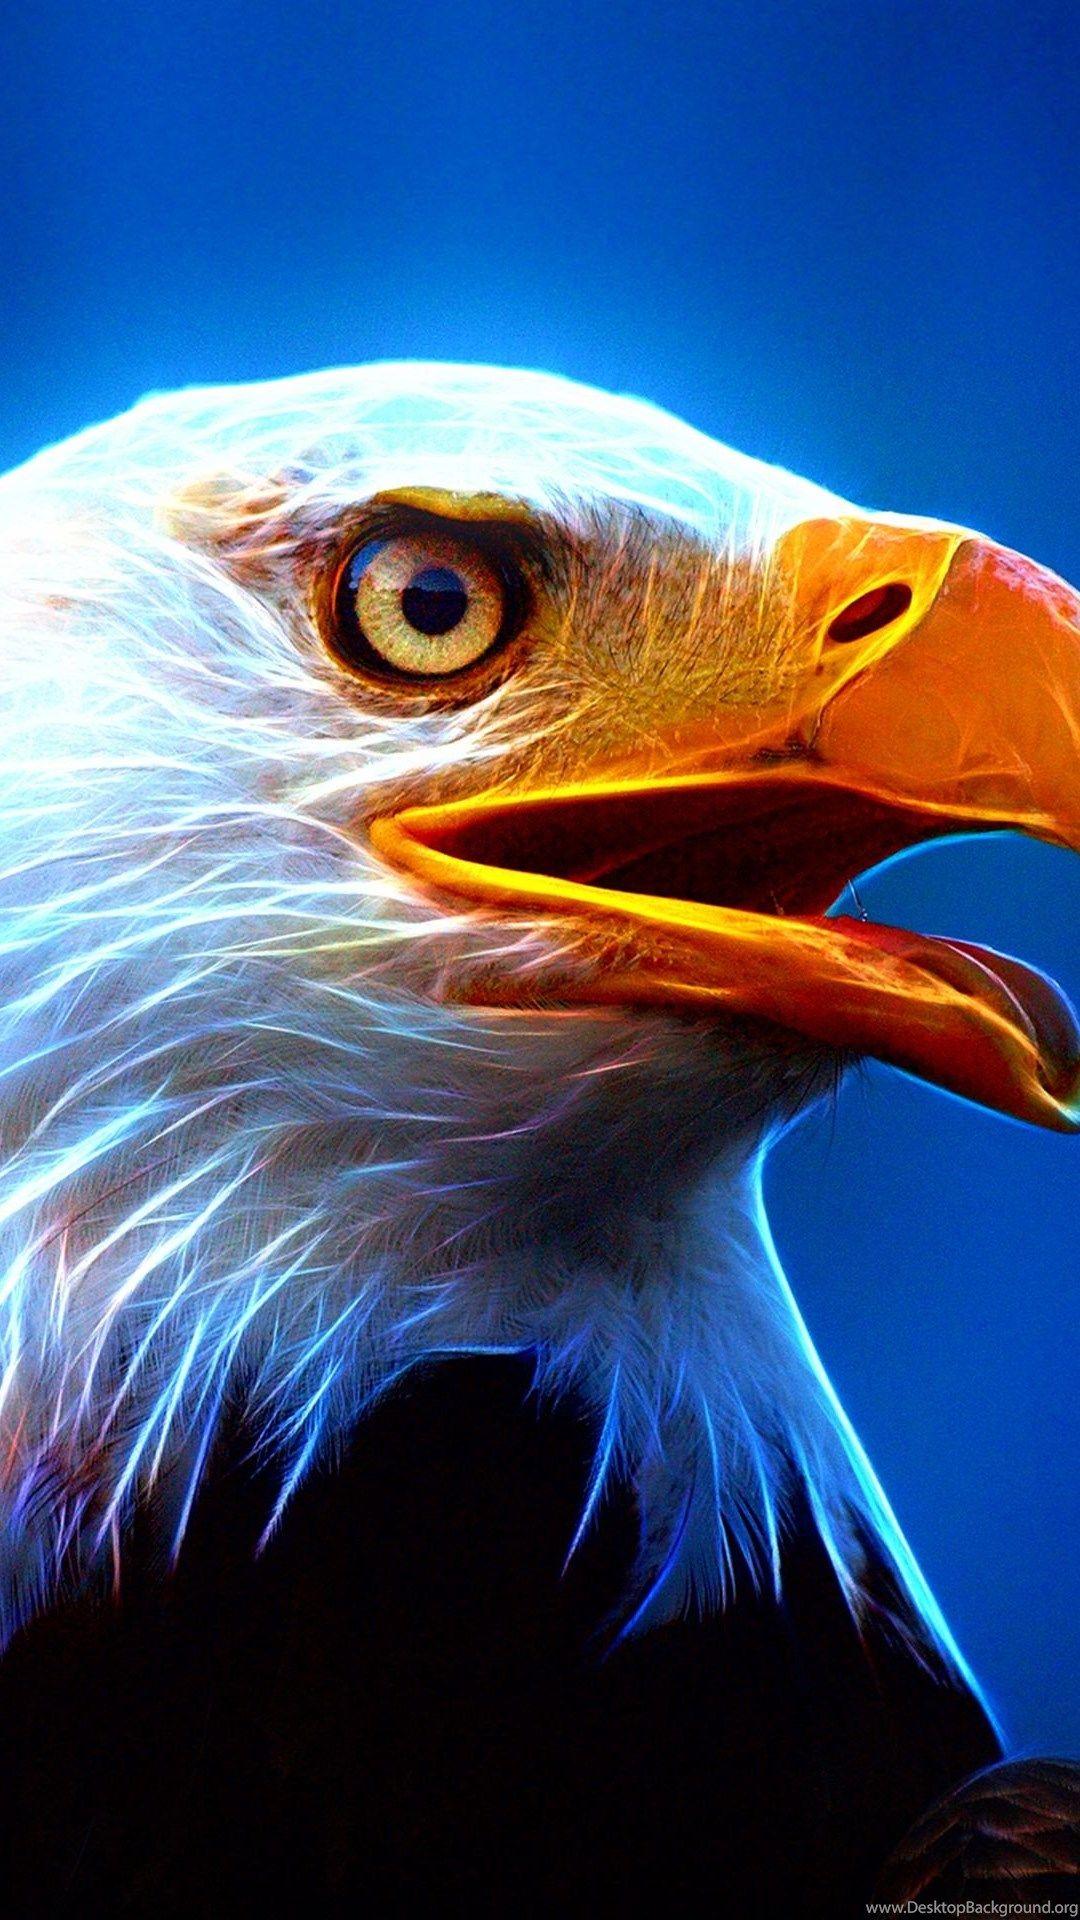 Hd Eagle Wallpapers Desktop Background